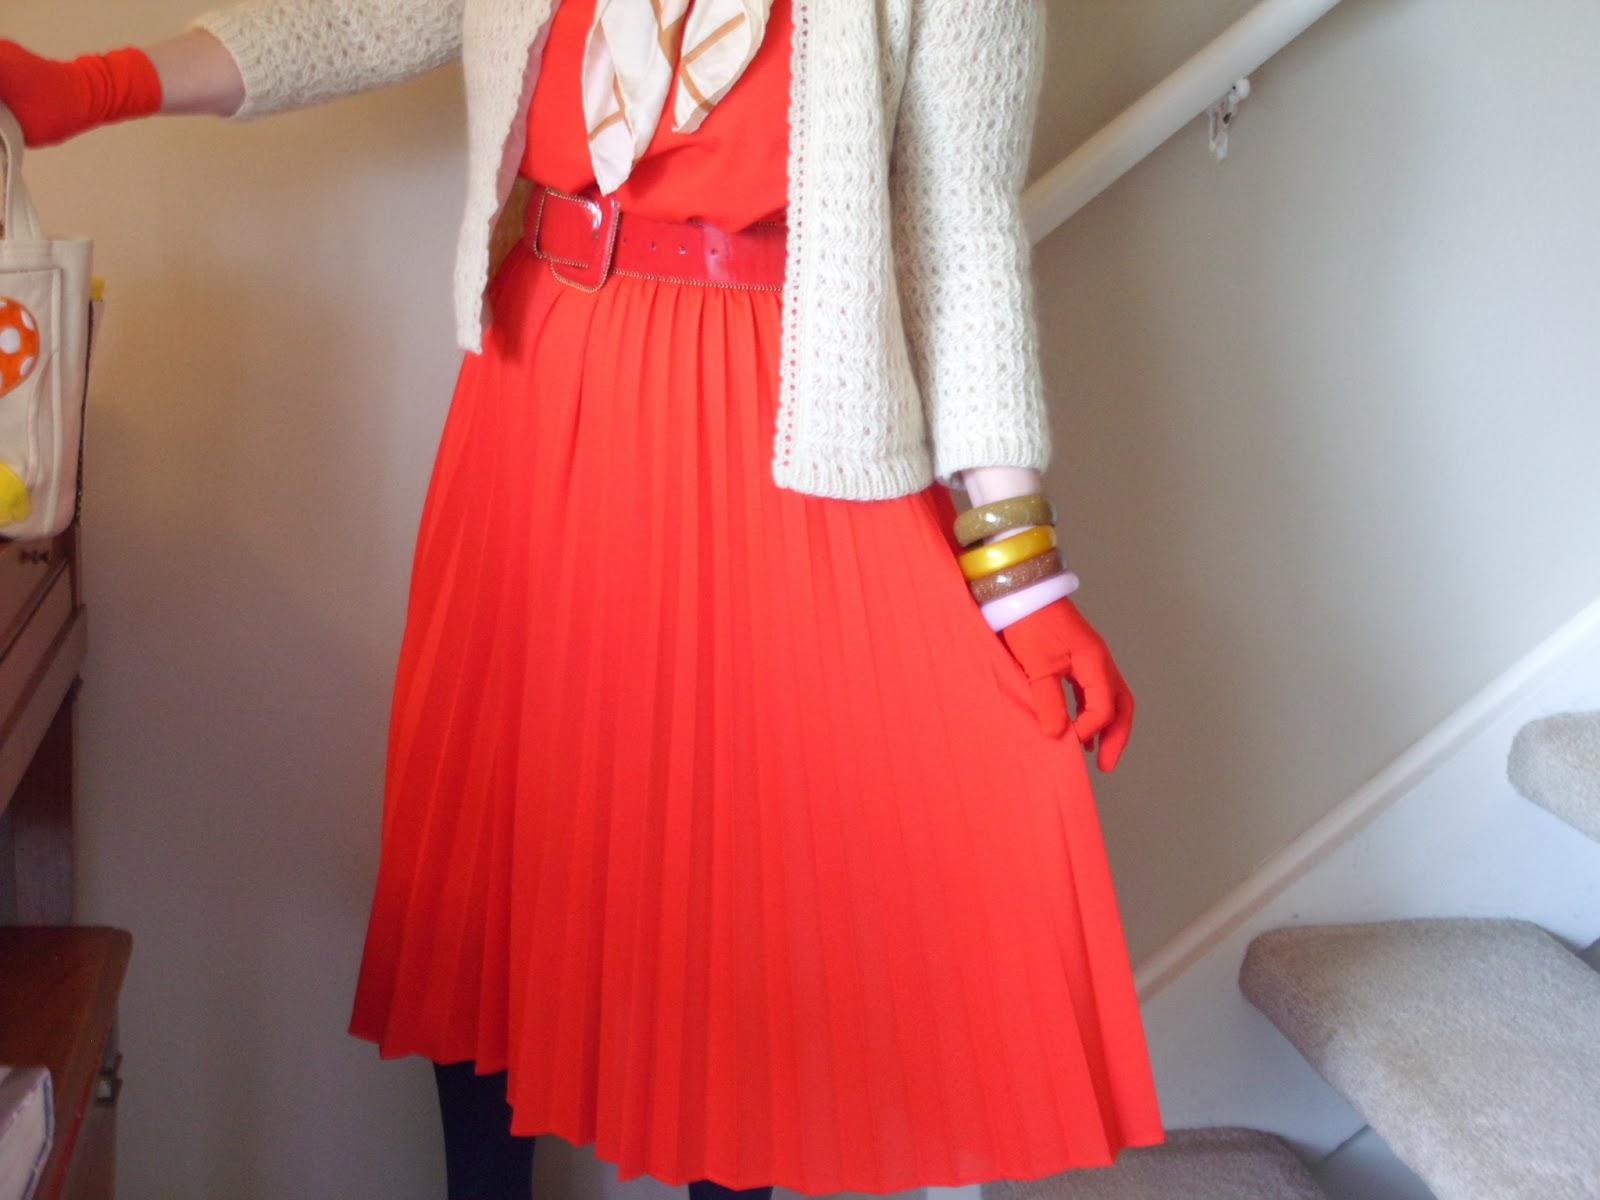 Eat the blog little orphan annie dress